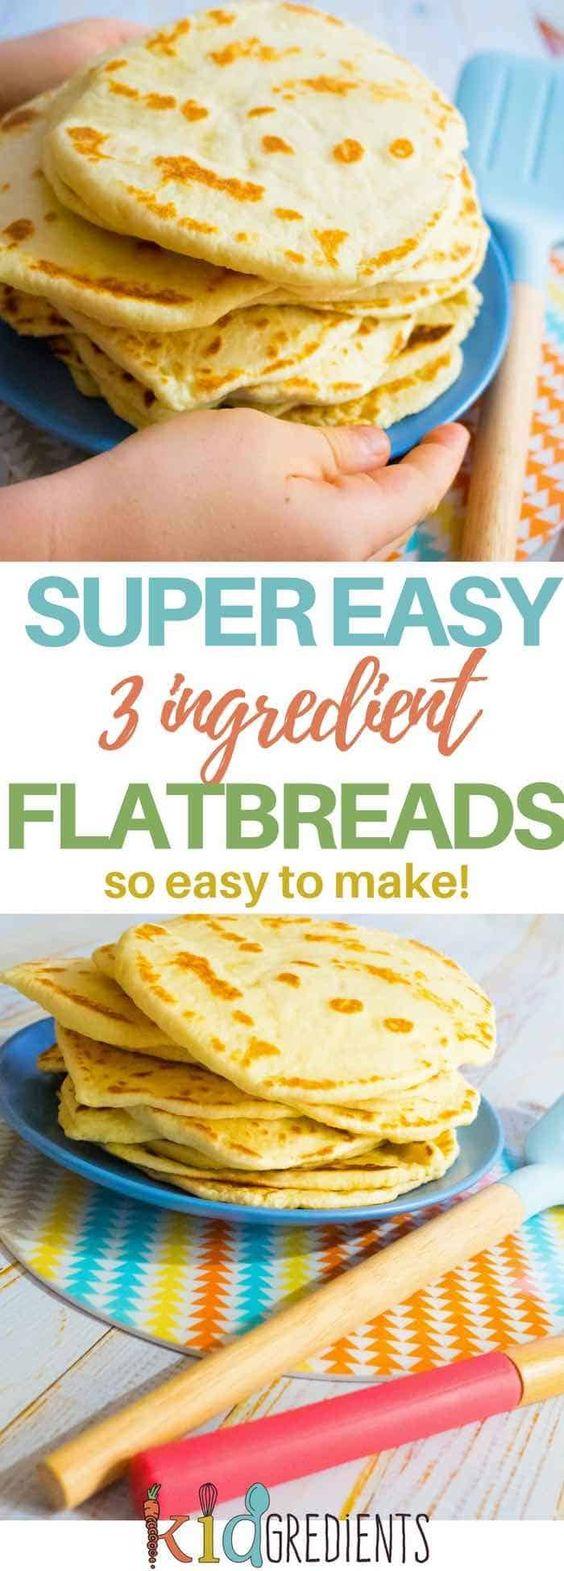 Super easy 3 ingredient flatbreads